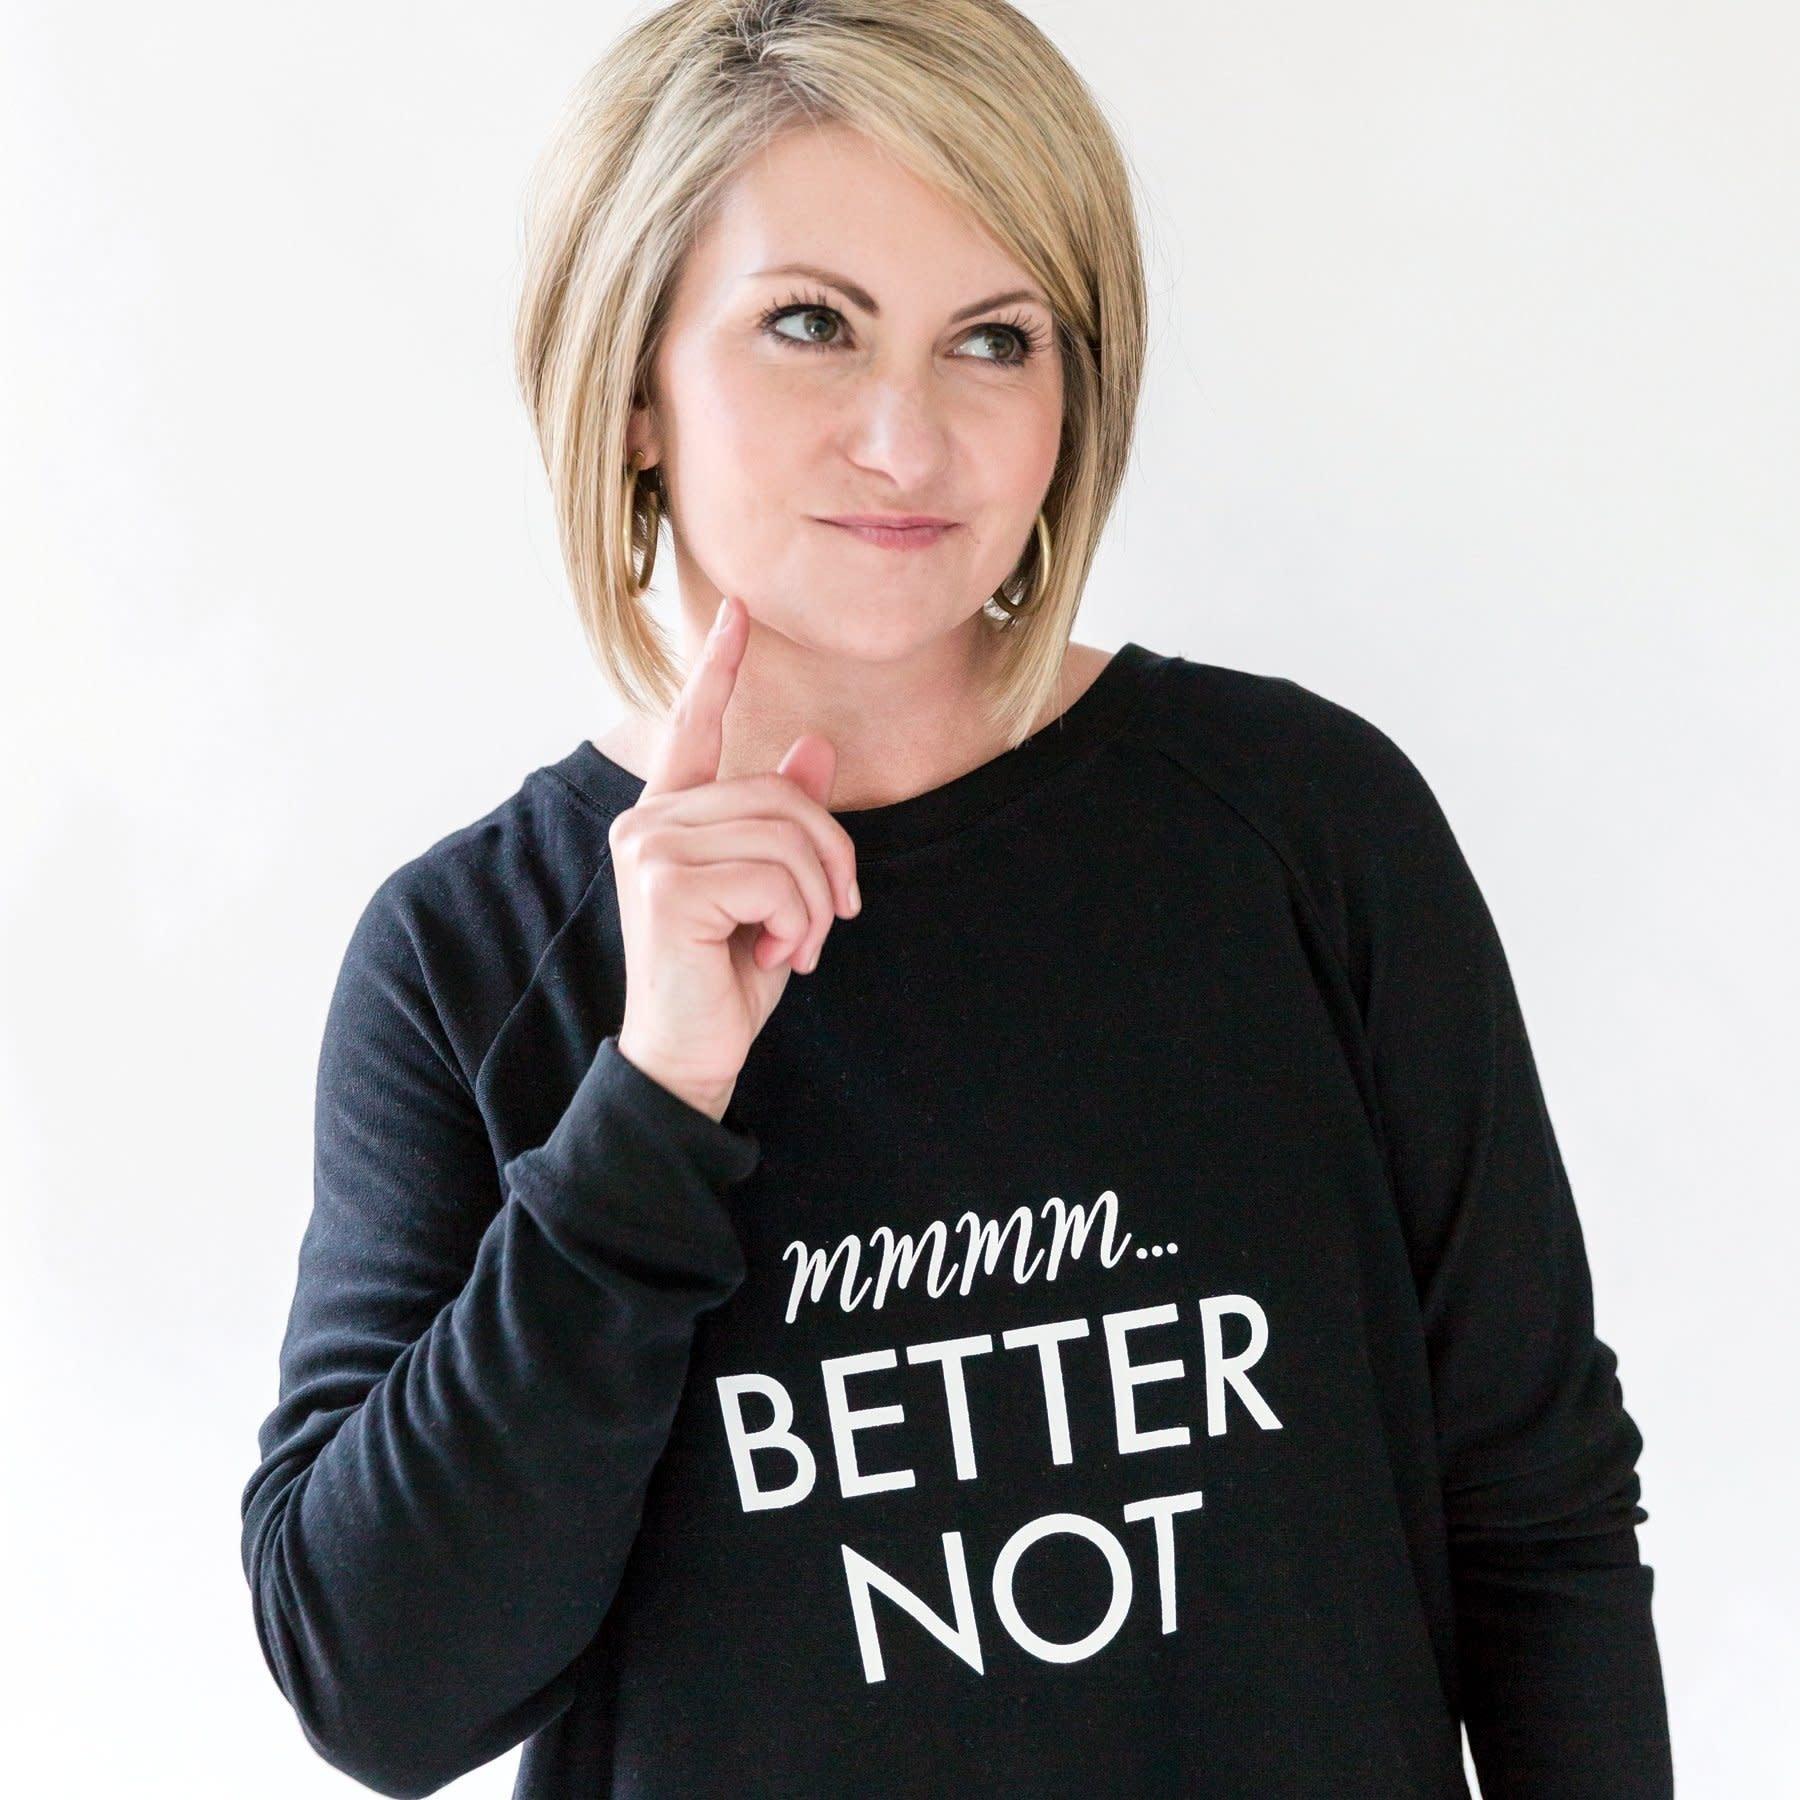 Mary Square Sweatshirt Better Not